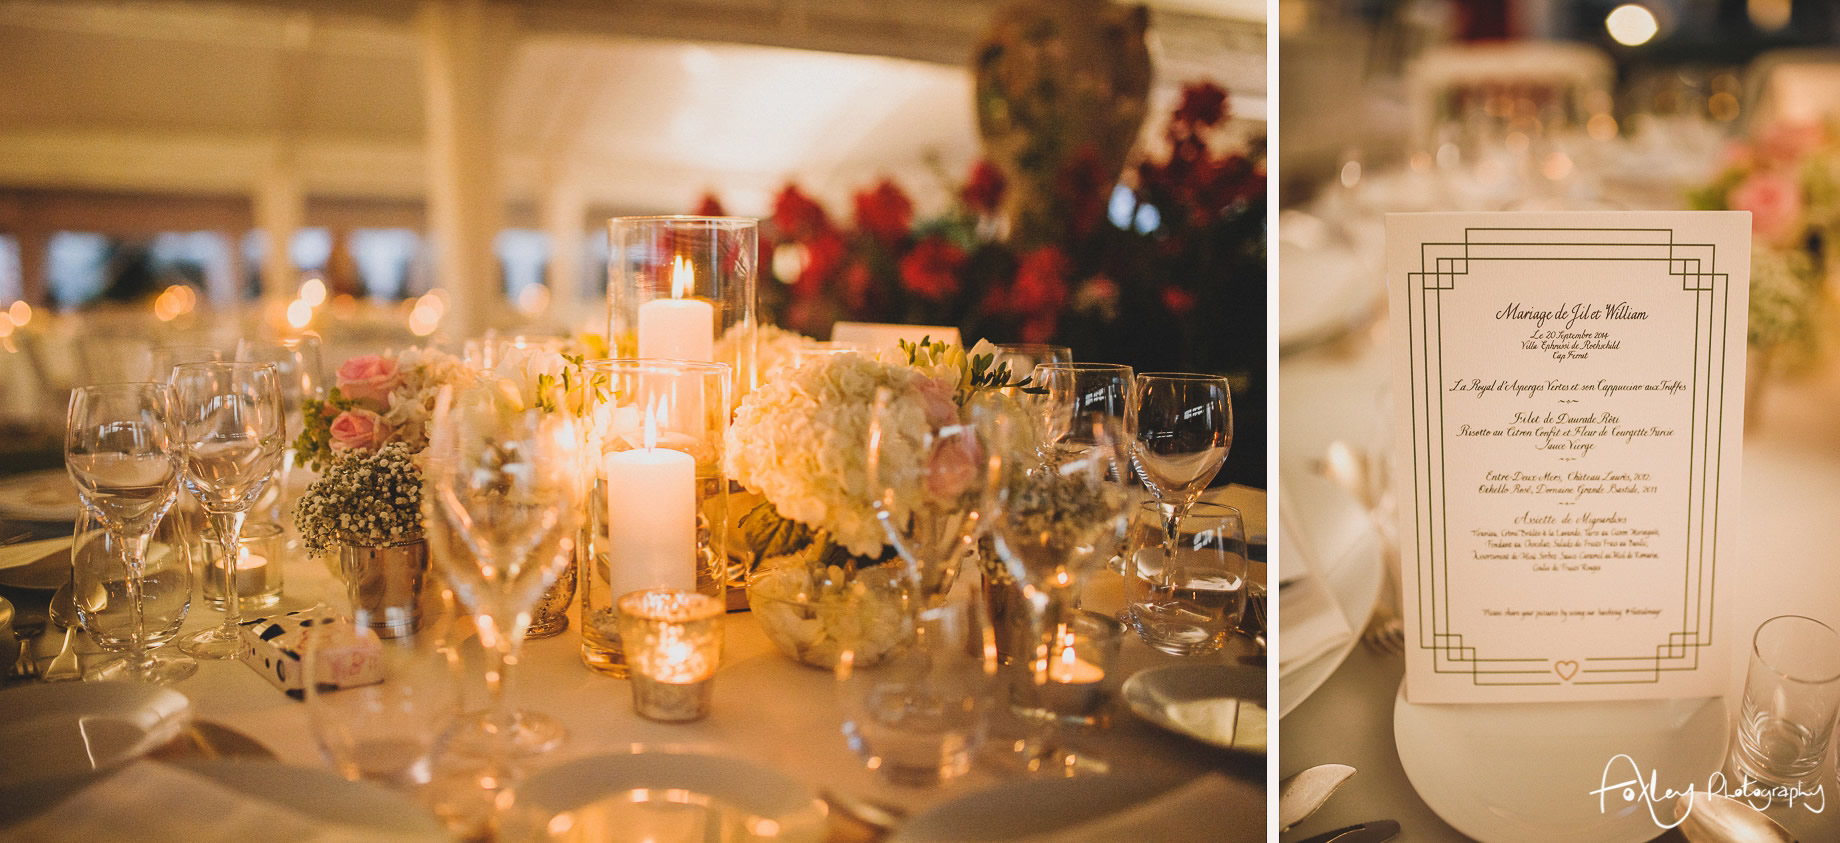 Jil and Will's Wedding at Villa Ephrussi De Rothschild 157